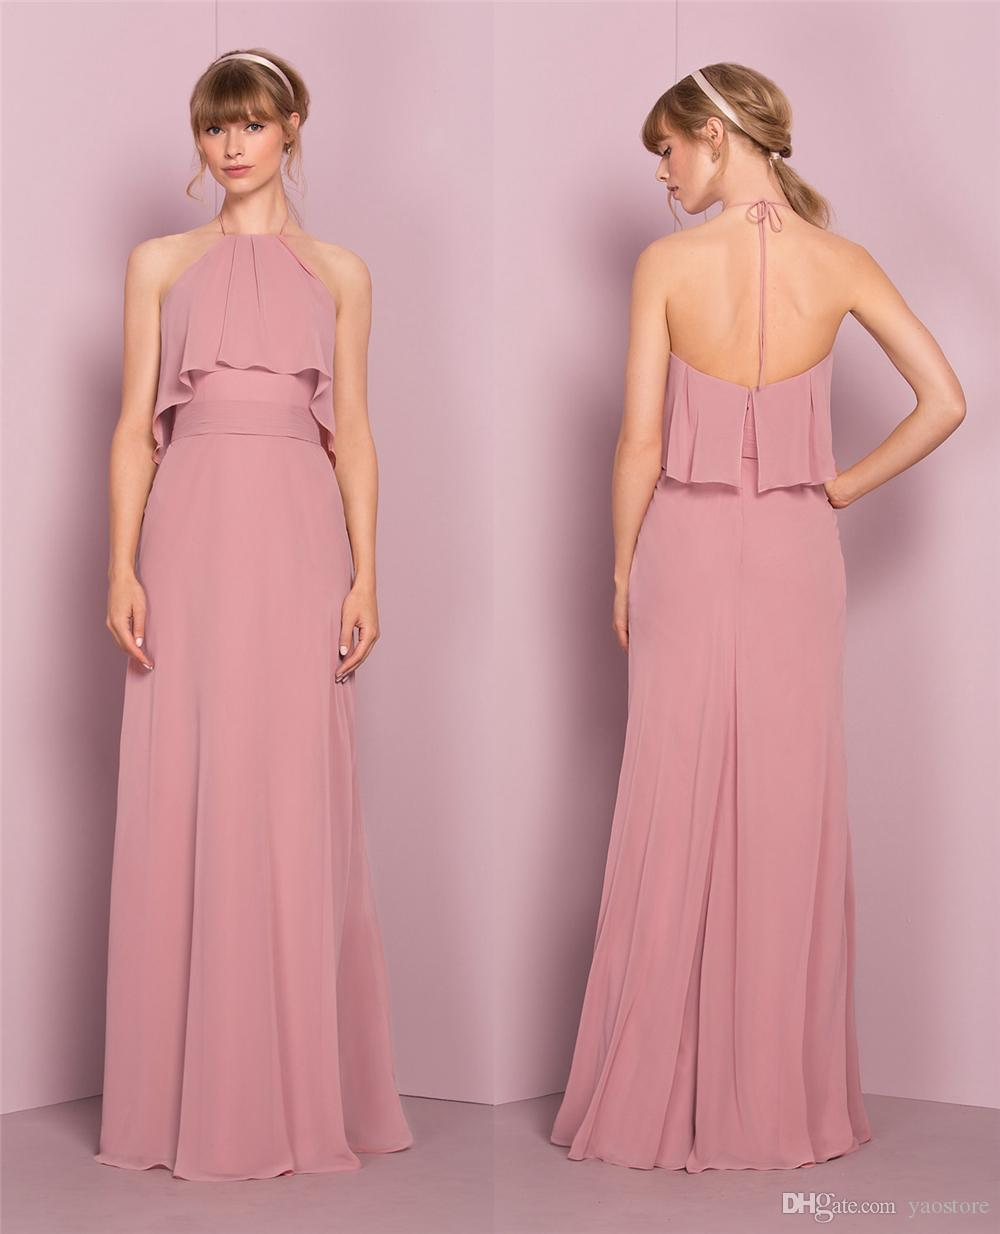 Elegant soft chiffon long bridesmaid dresses modern halter neck see larger image ombrellifo Image collections